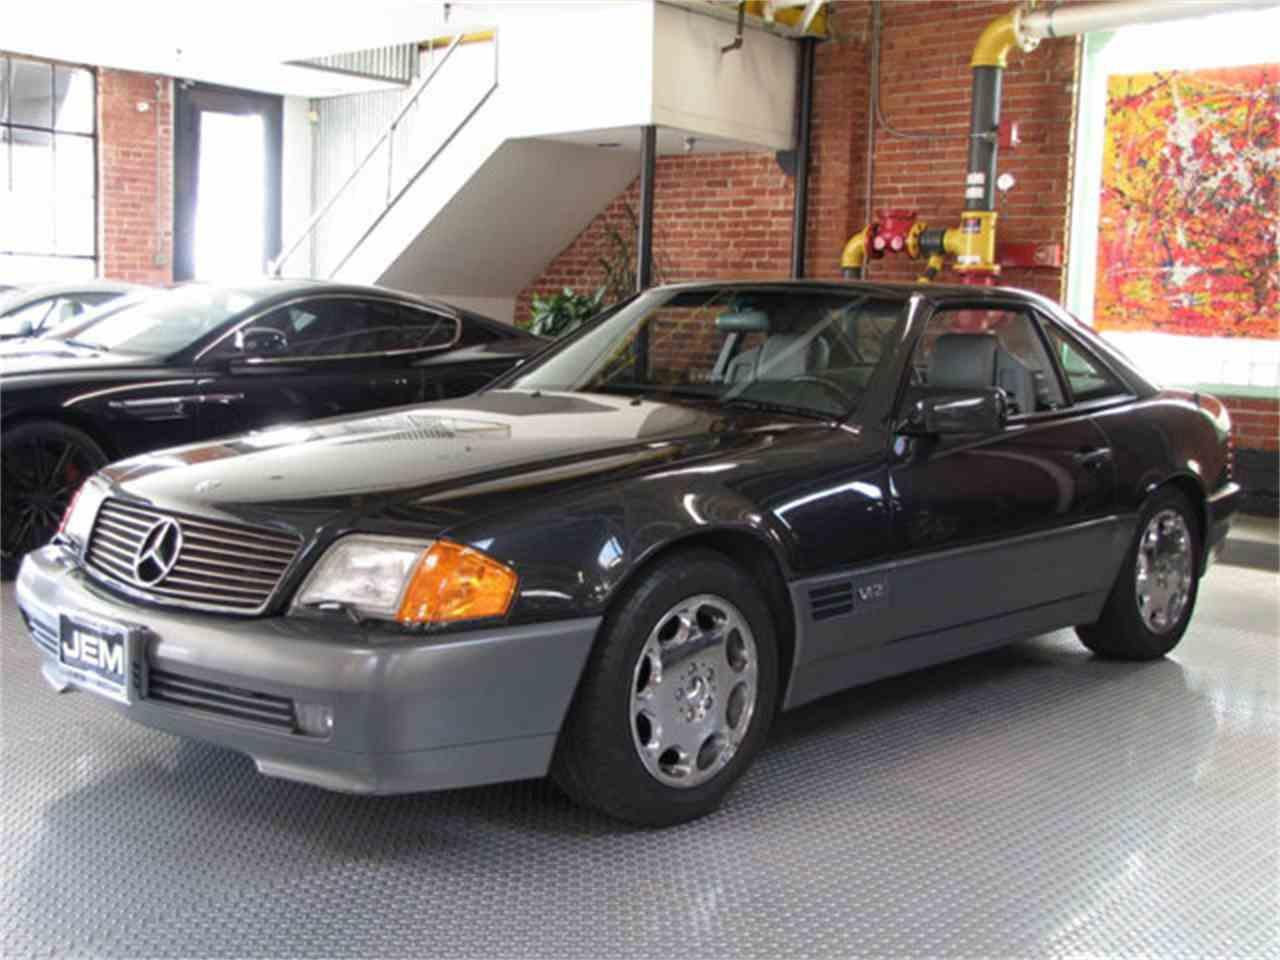 1993 Mercedes-Benz 600 for Sale - CC-1039679